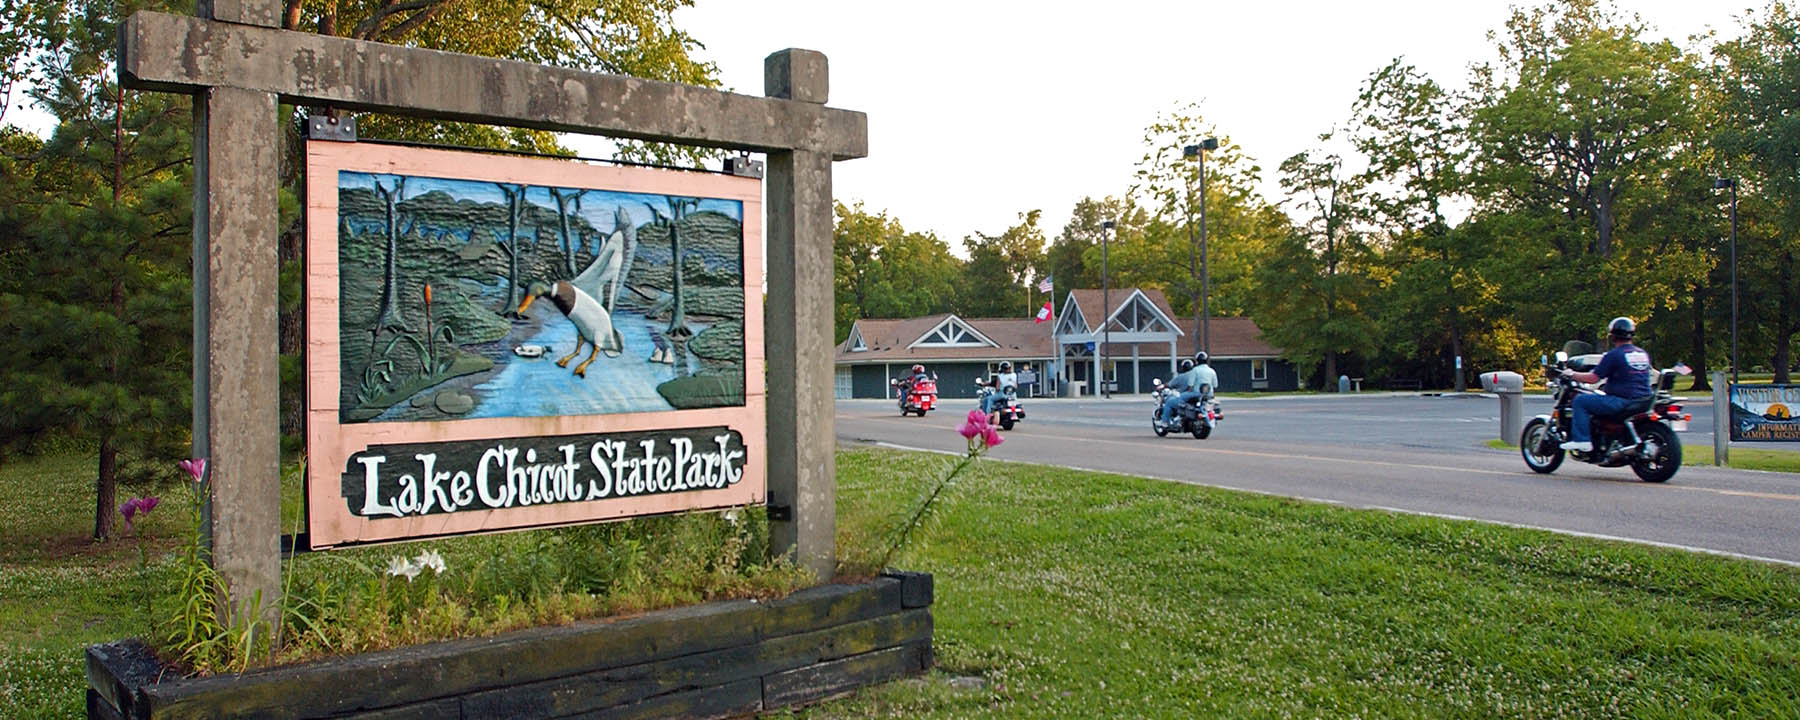 Arkansas-Good-Roads-Foundation-Scholarships-Image